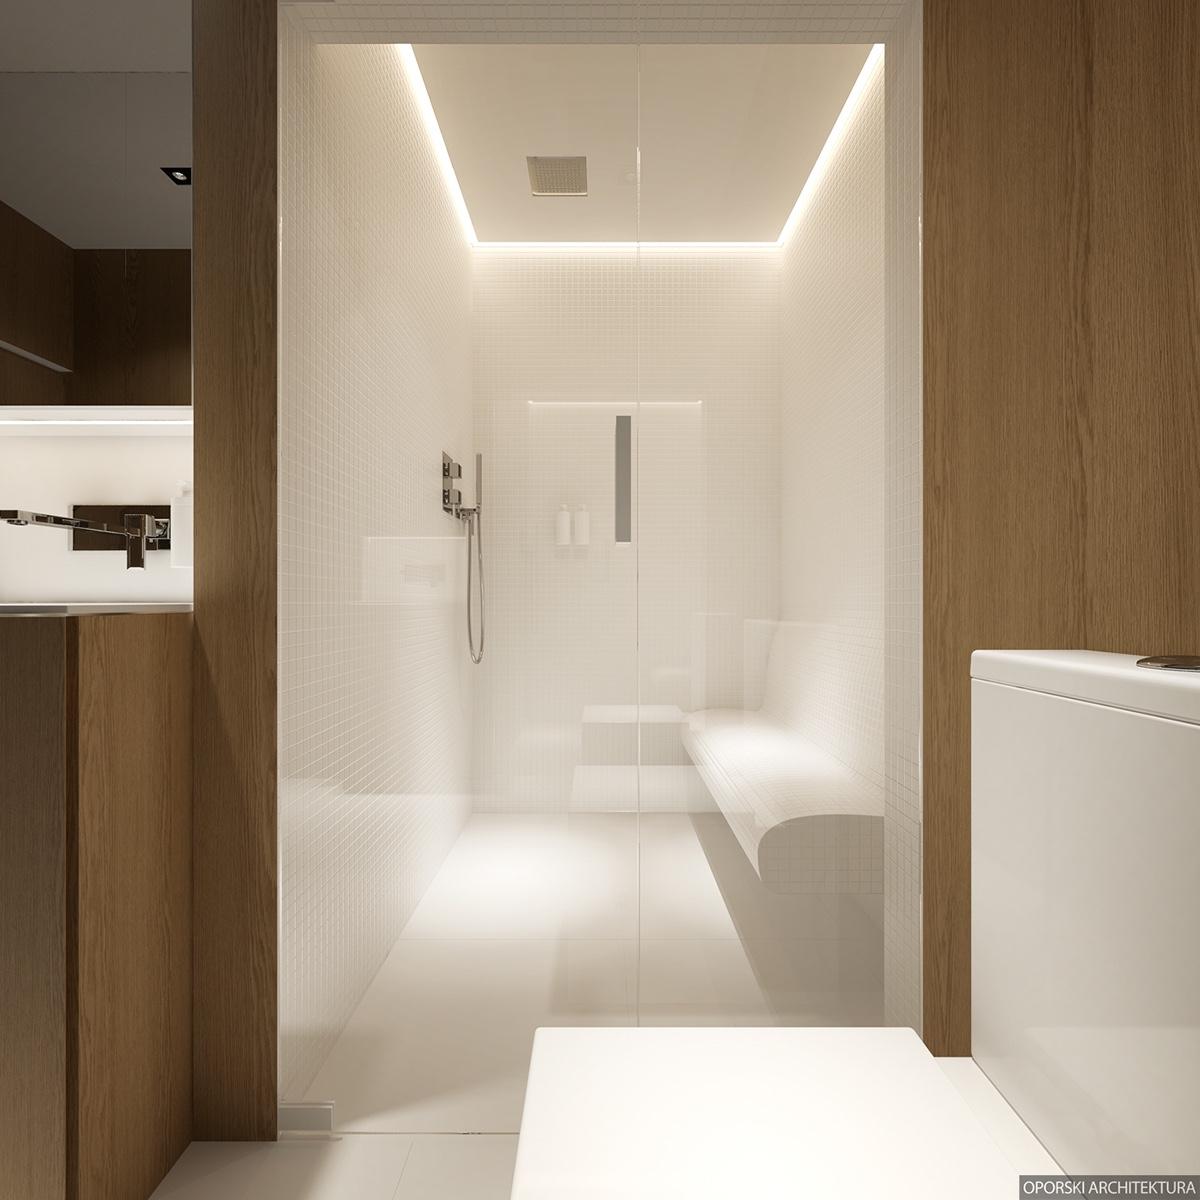 Scandinavian Bathroom Design Ideas: 5 Innovative Apartment Designs That Make Small Areas Sing